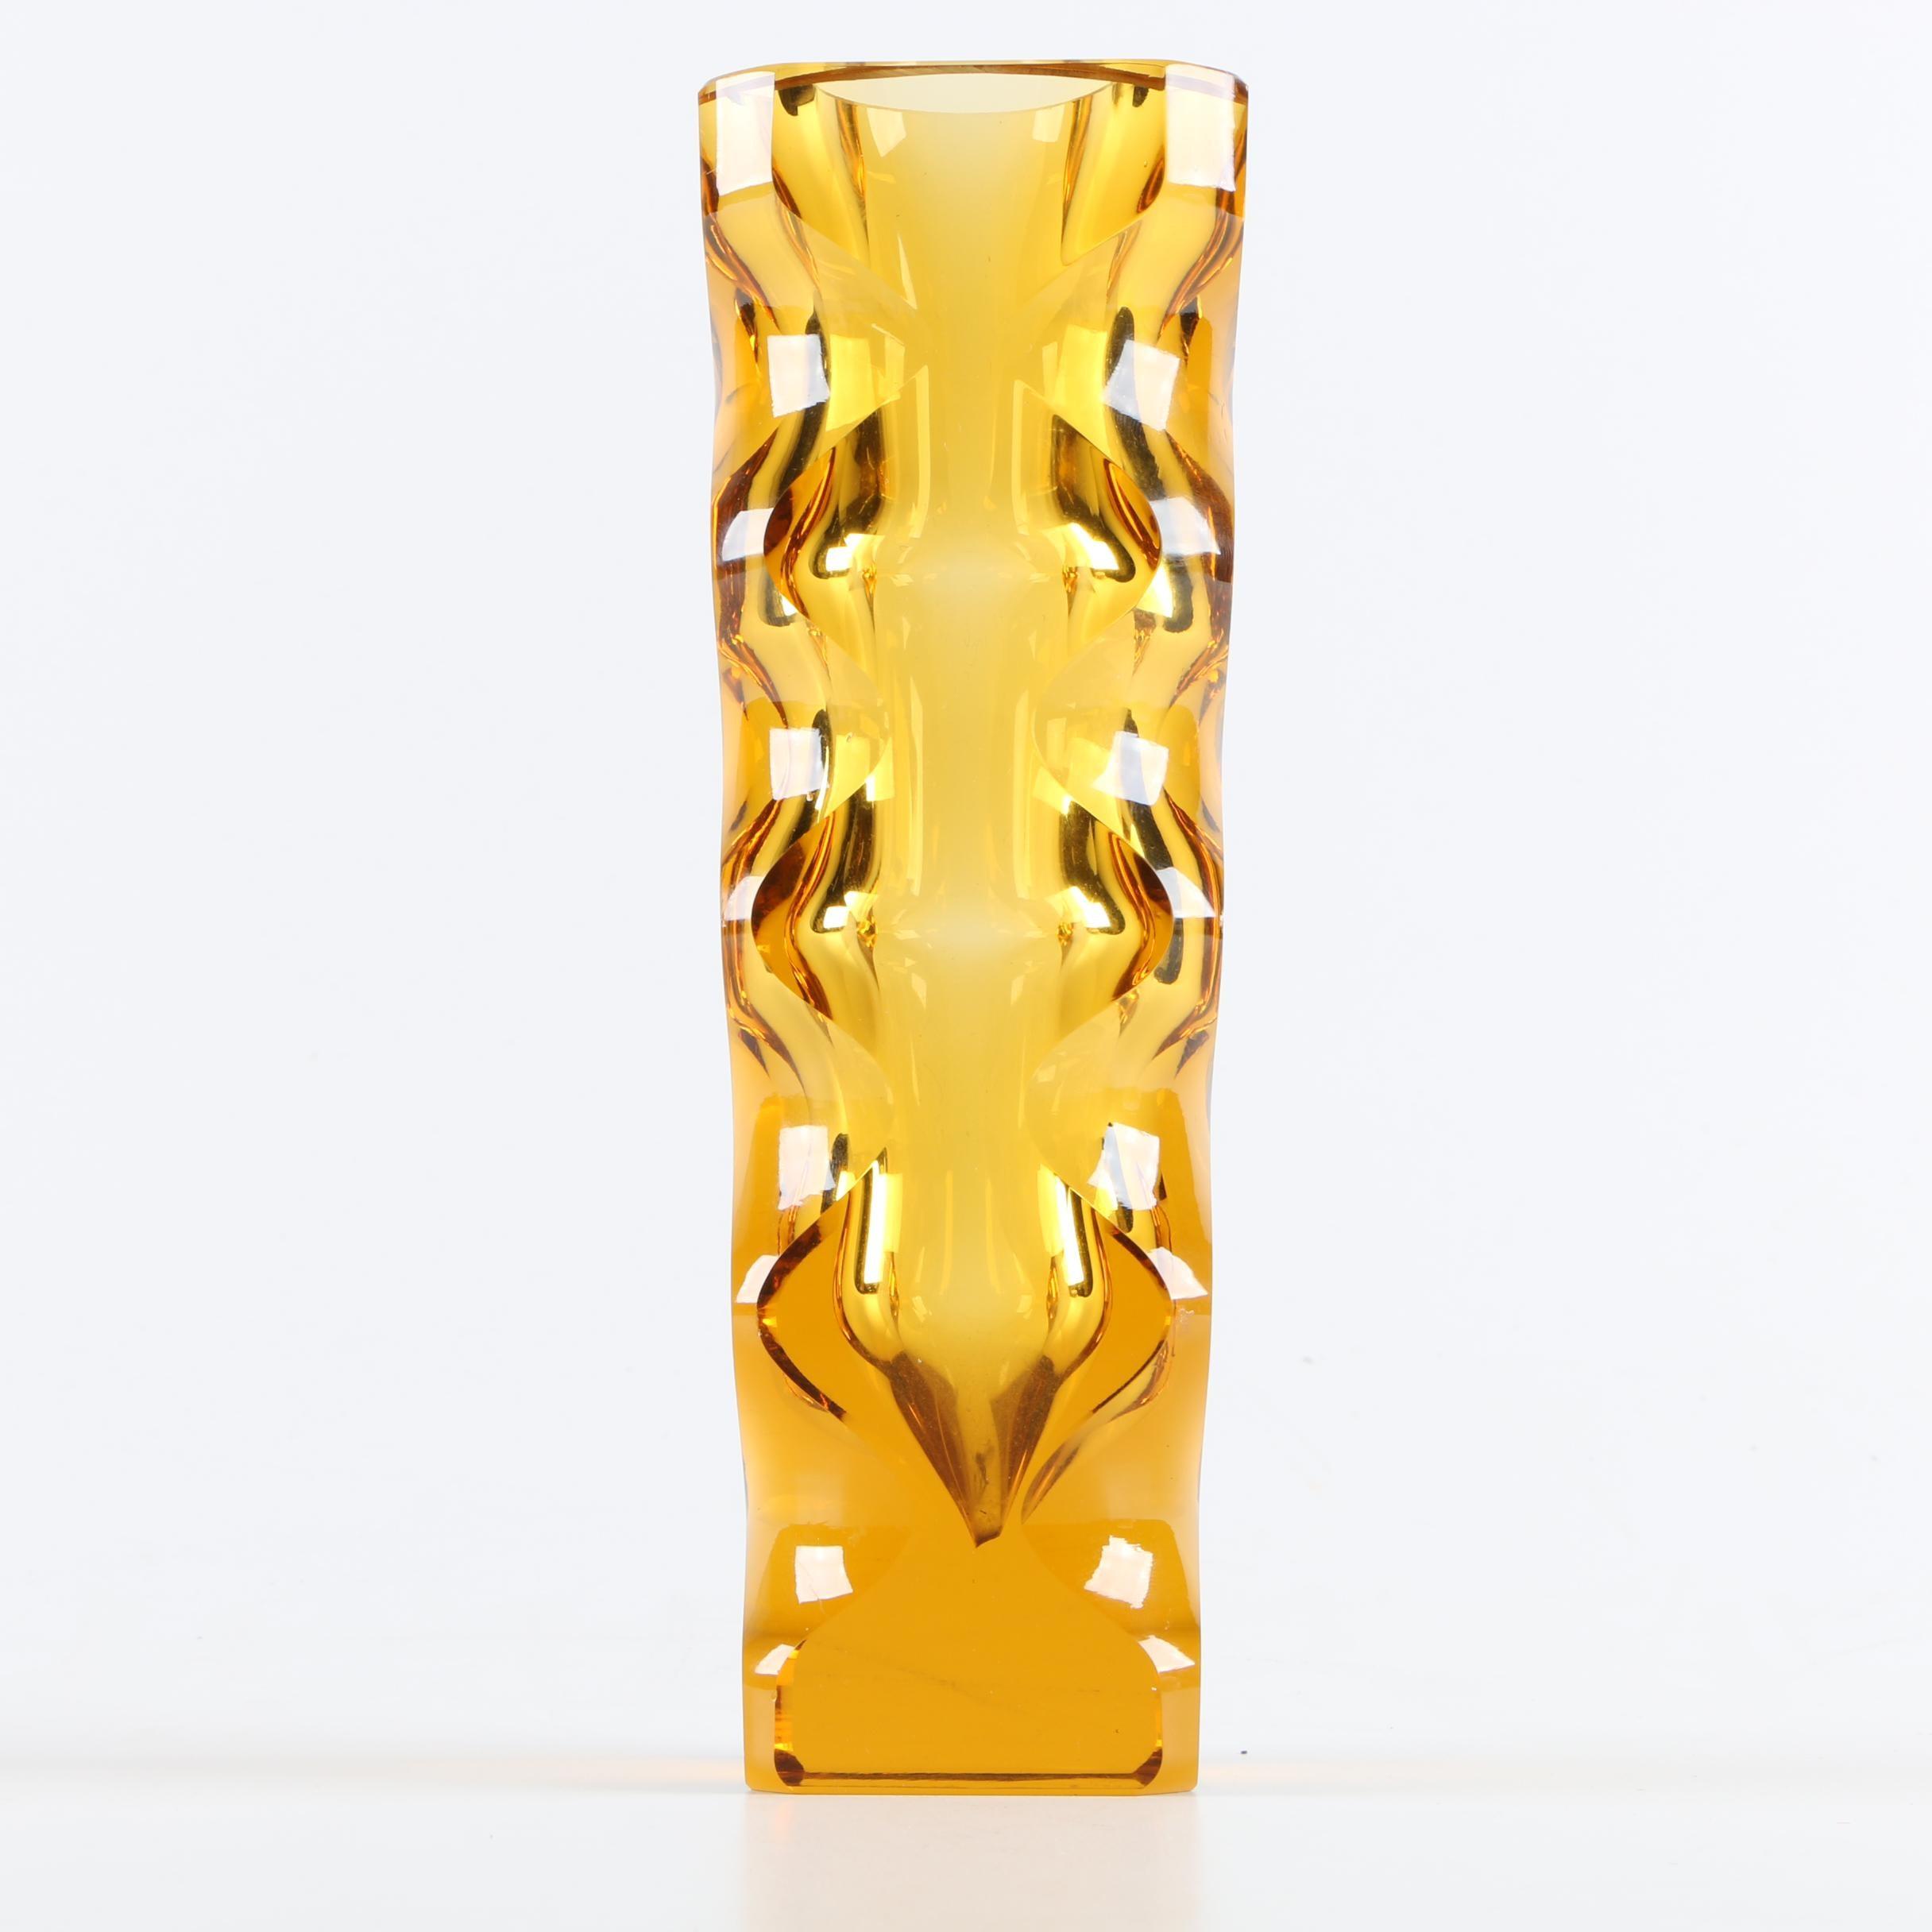 Oldrich Lipsky Bohemian Glass Vase